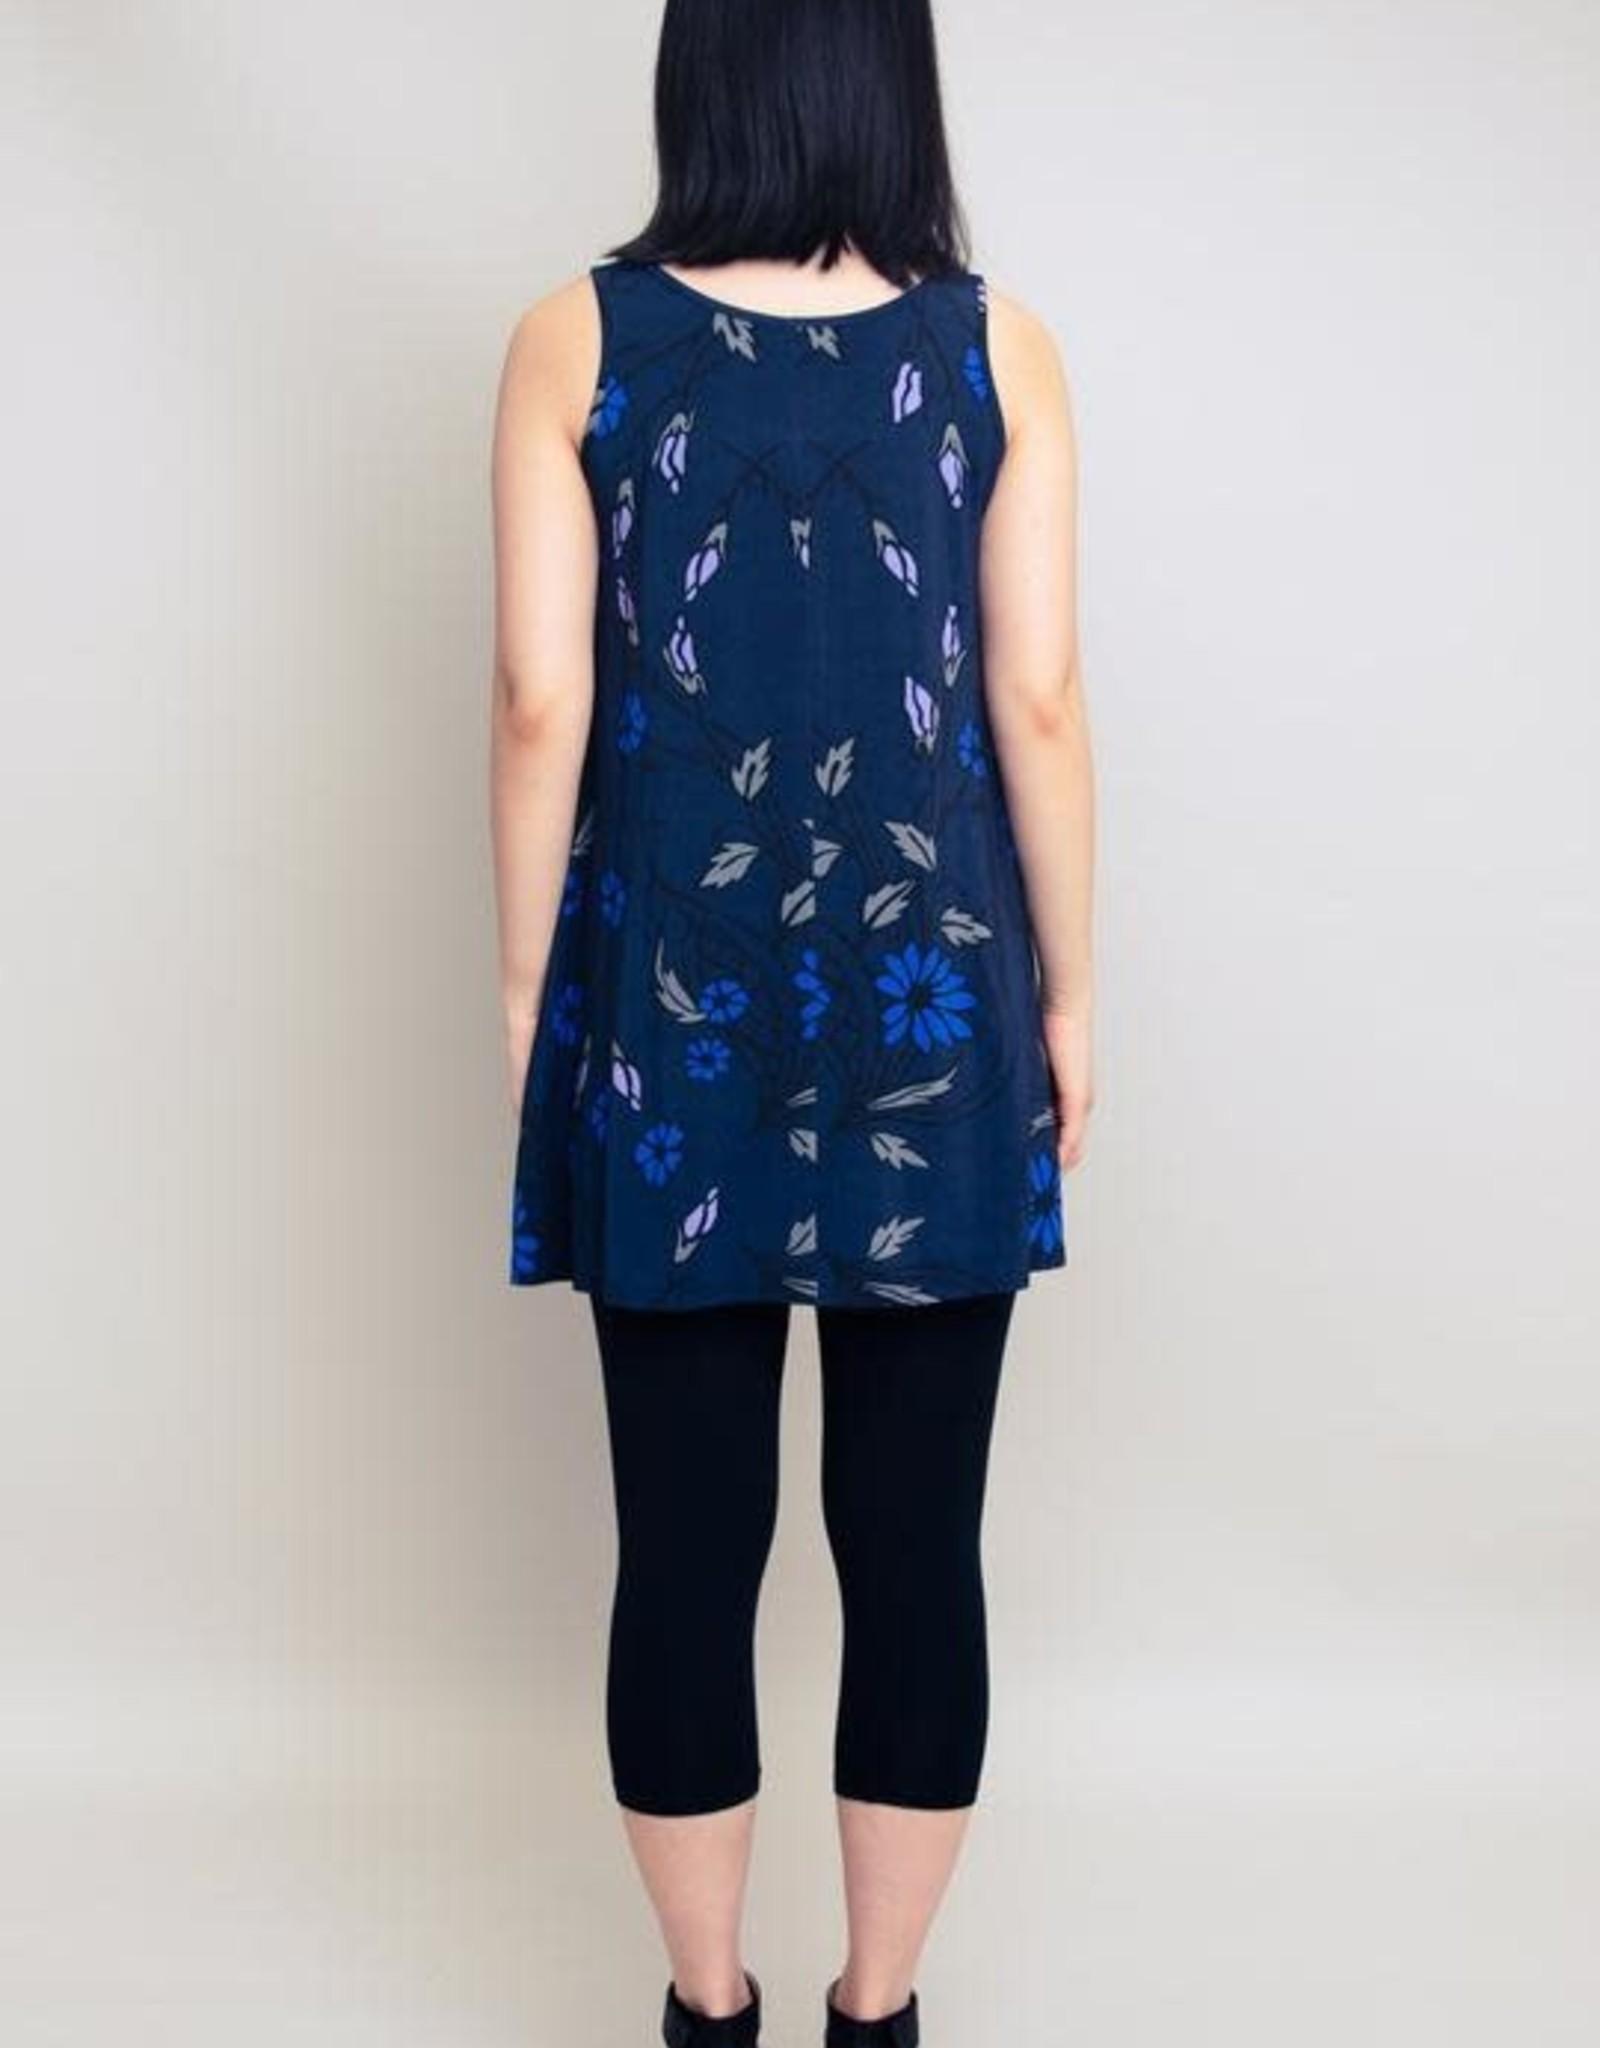 BLUE SKY SPIRIT DRESS - TWO PATTERNS